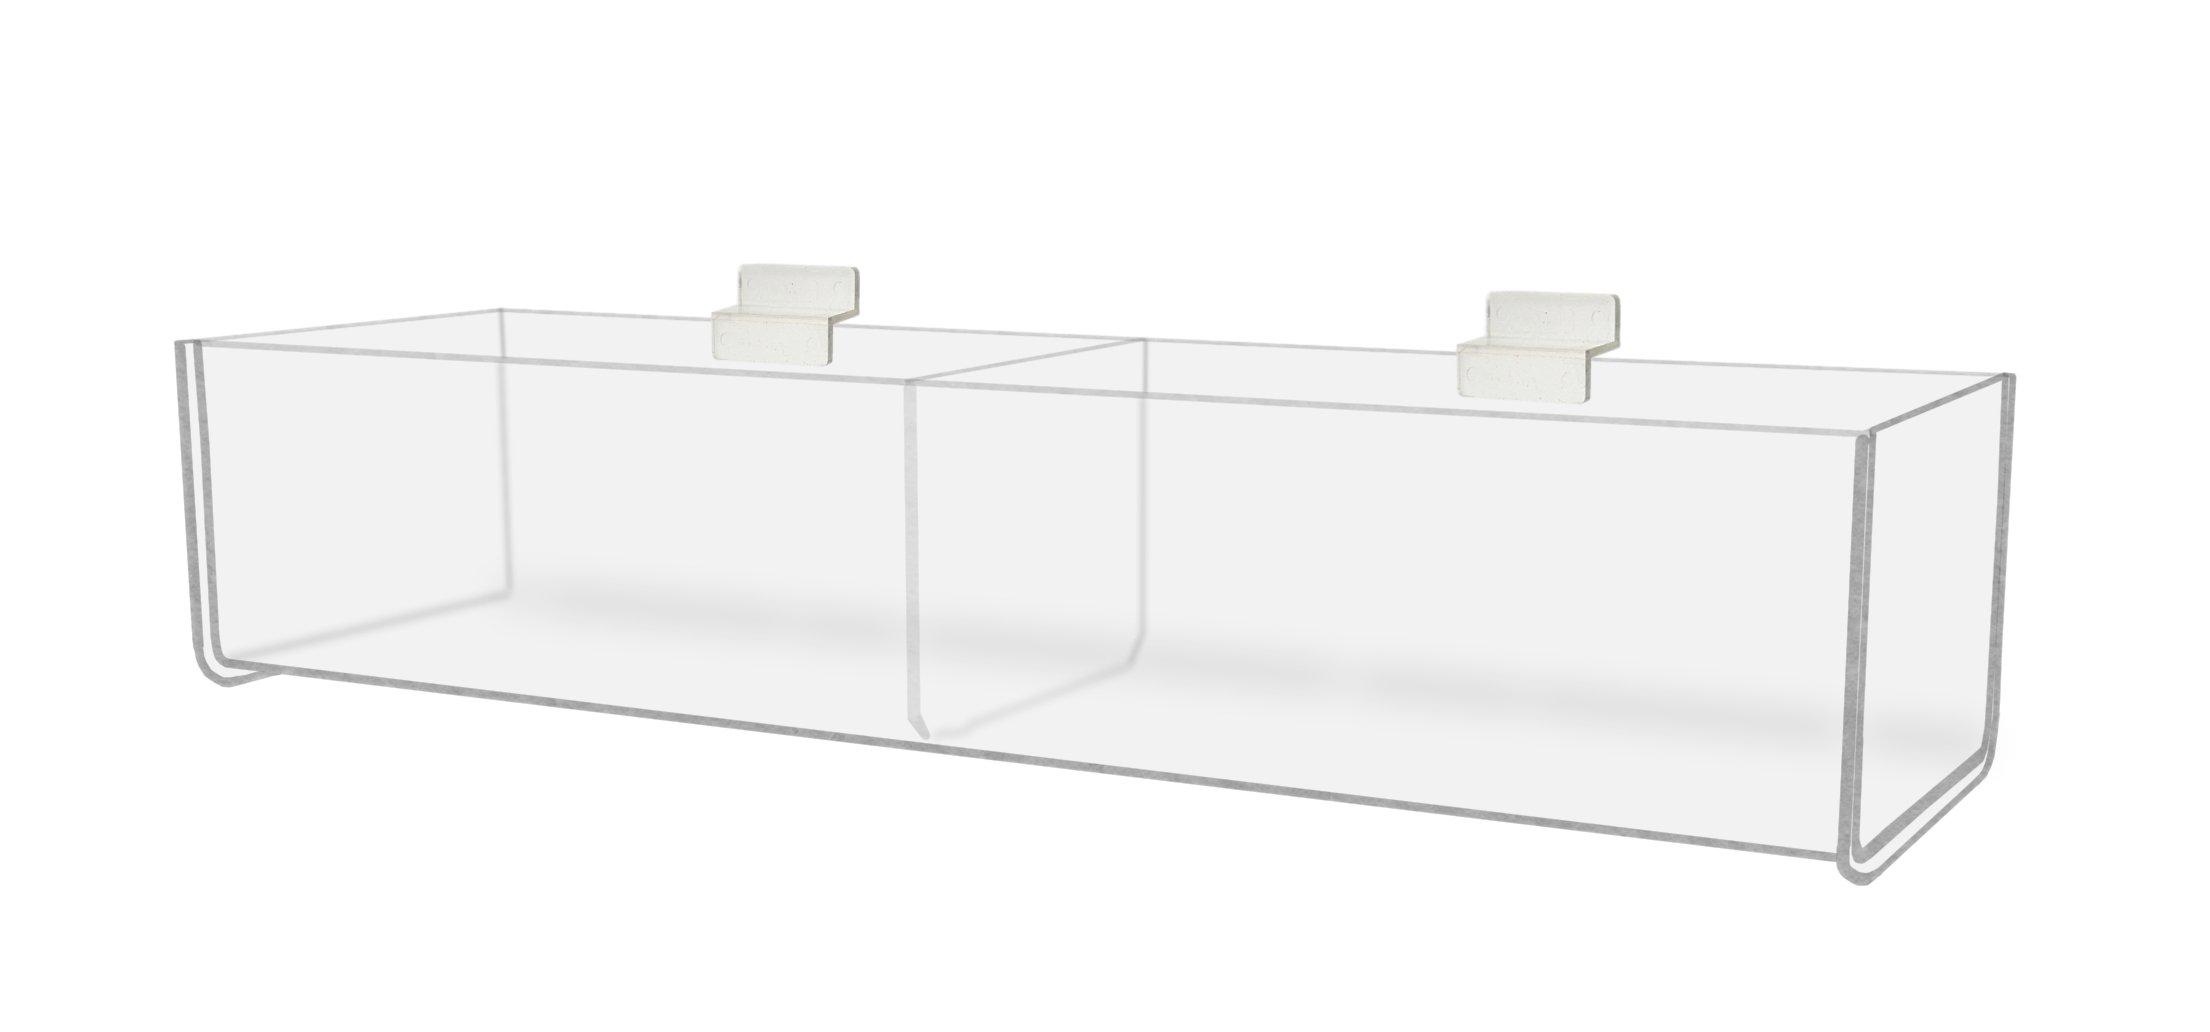 Marketing Holders Slatwall Bins Trays Organizer Display Racks Holders 16'' Bin 2 Pockets